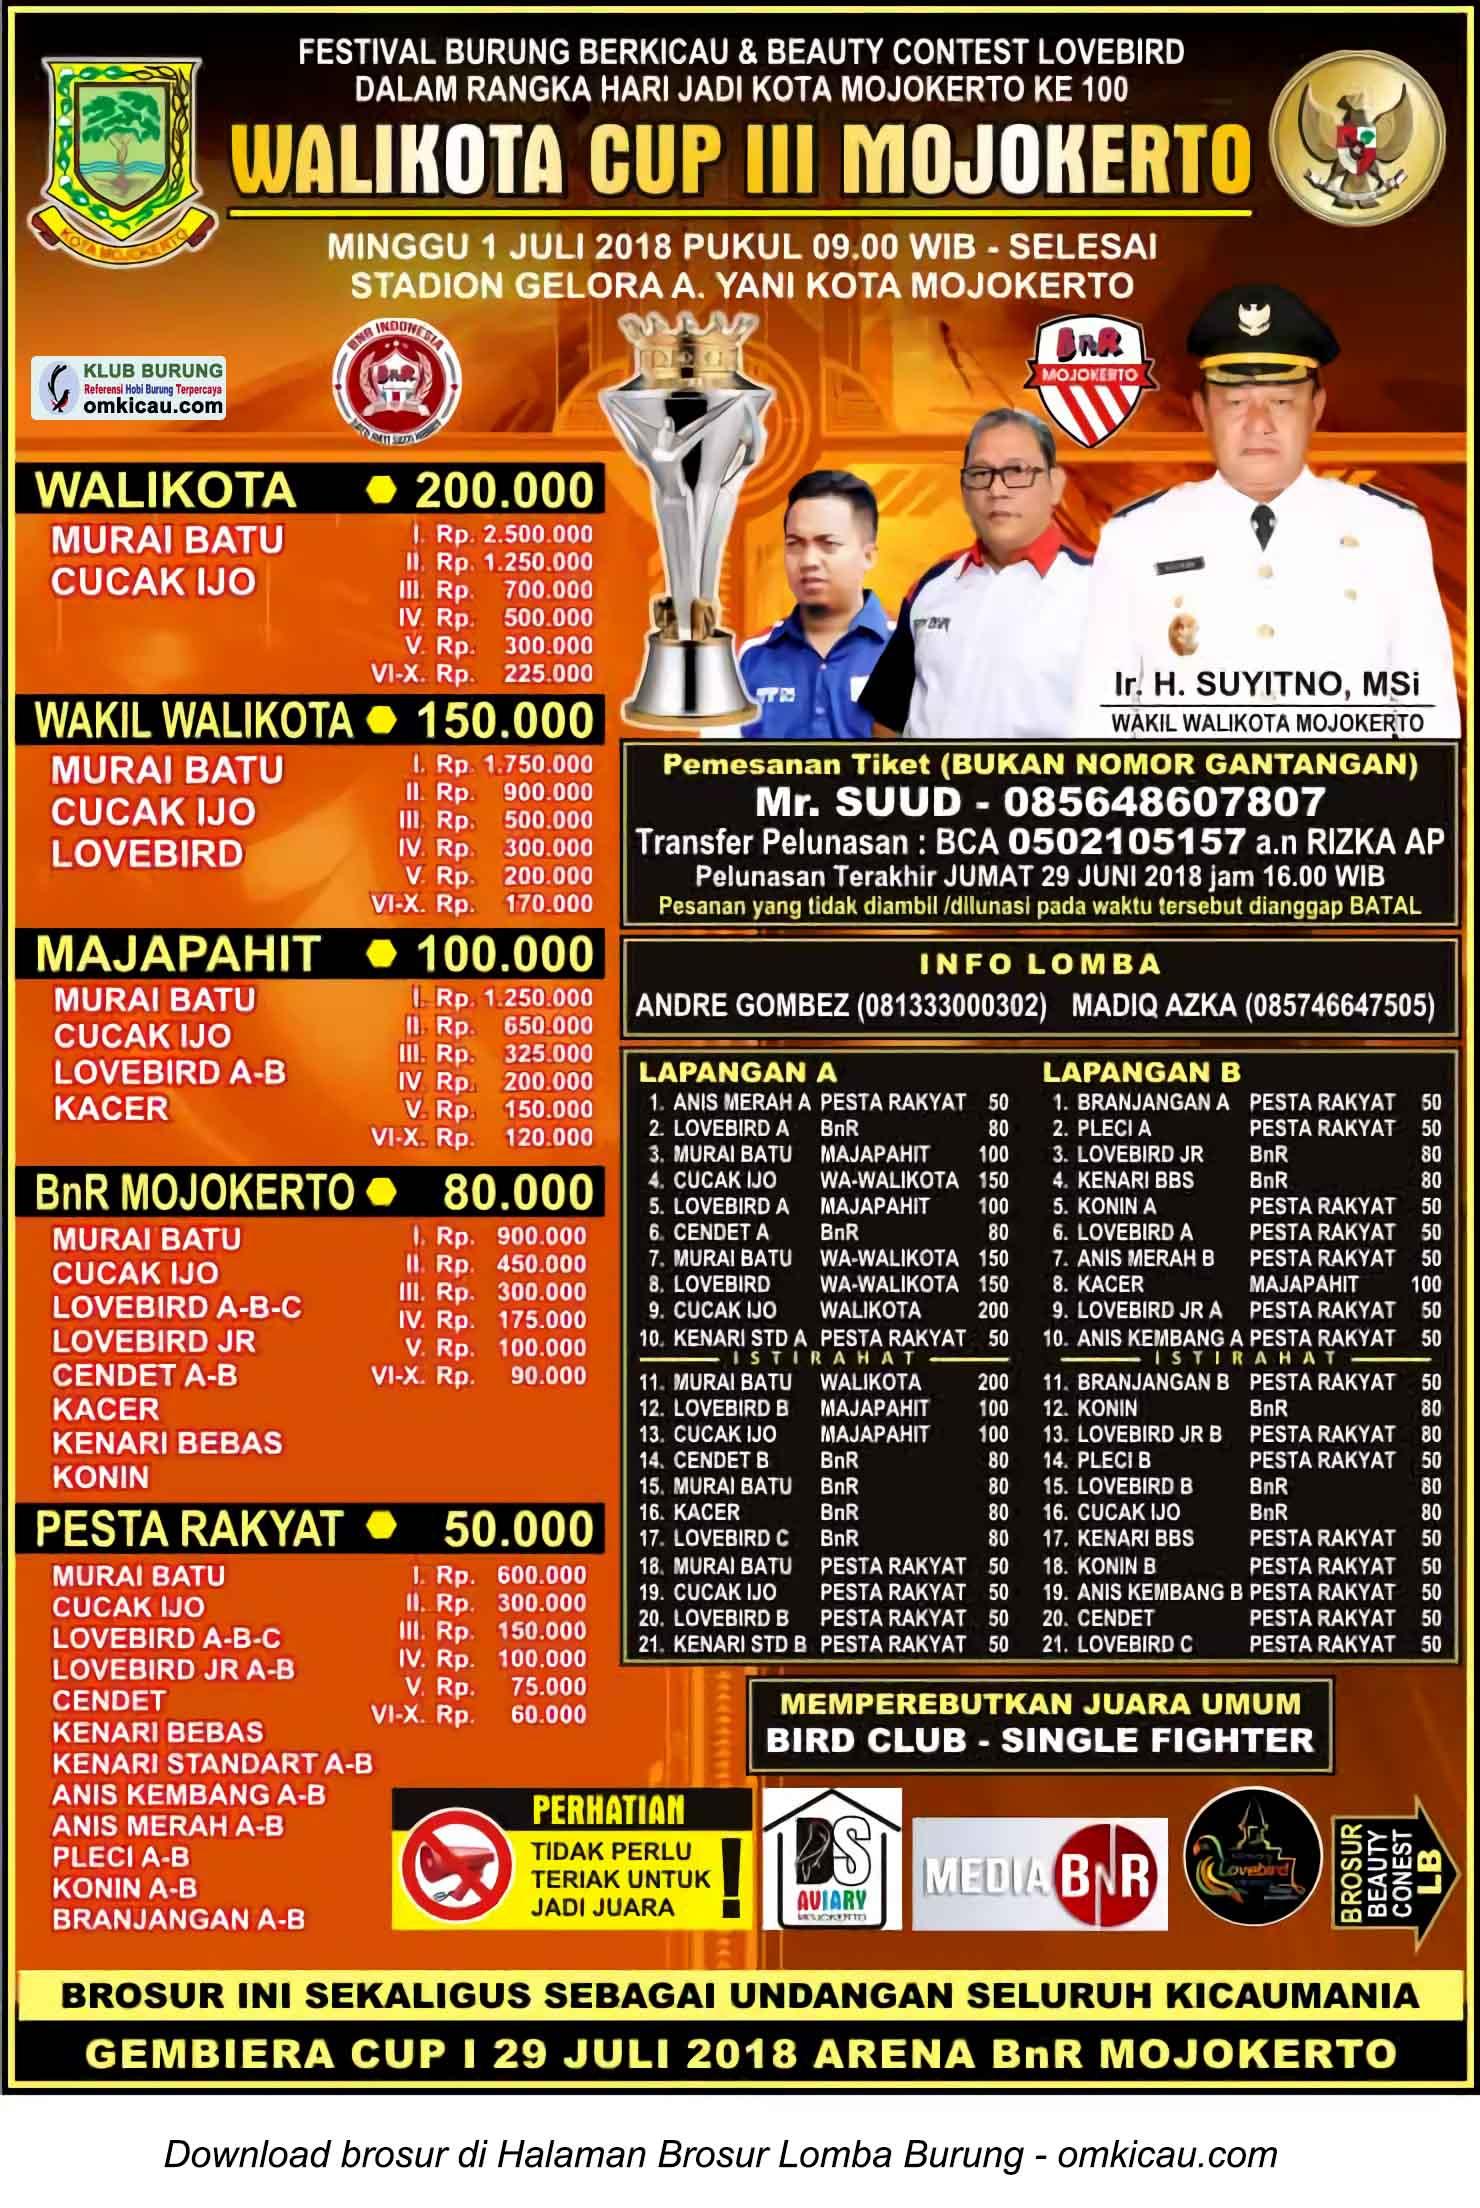 Wali Kota Cup III Mojokerto